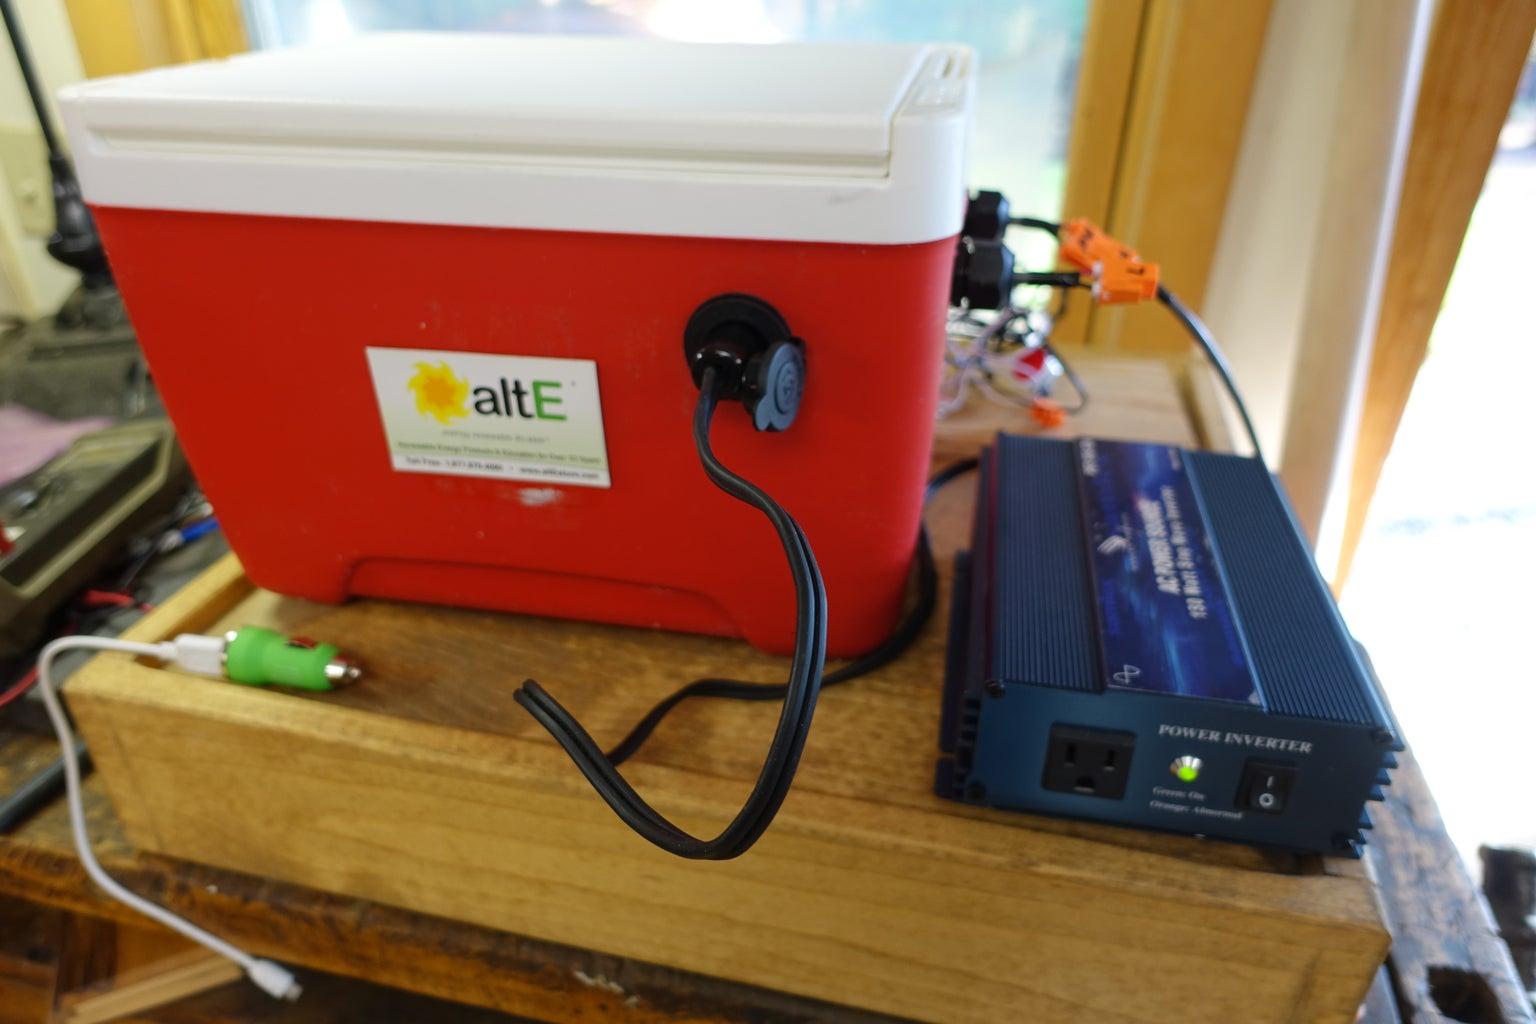 Optional: Plug in Inverter